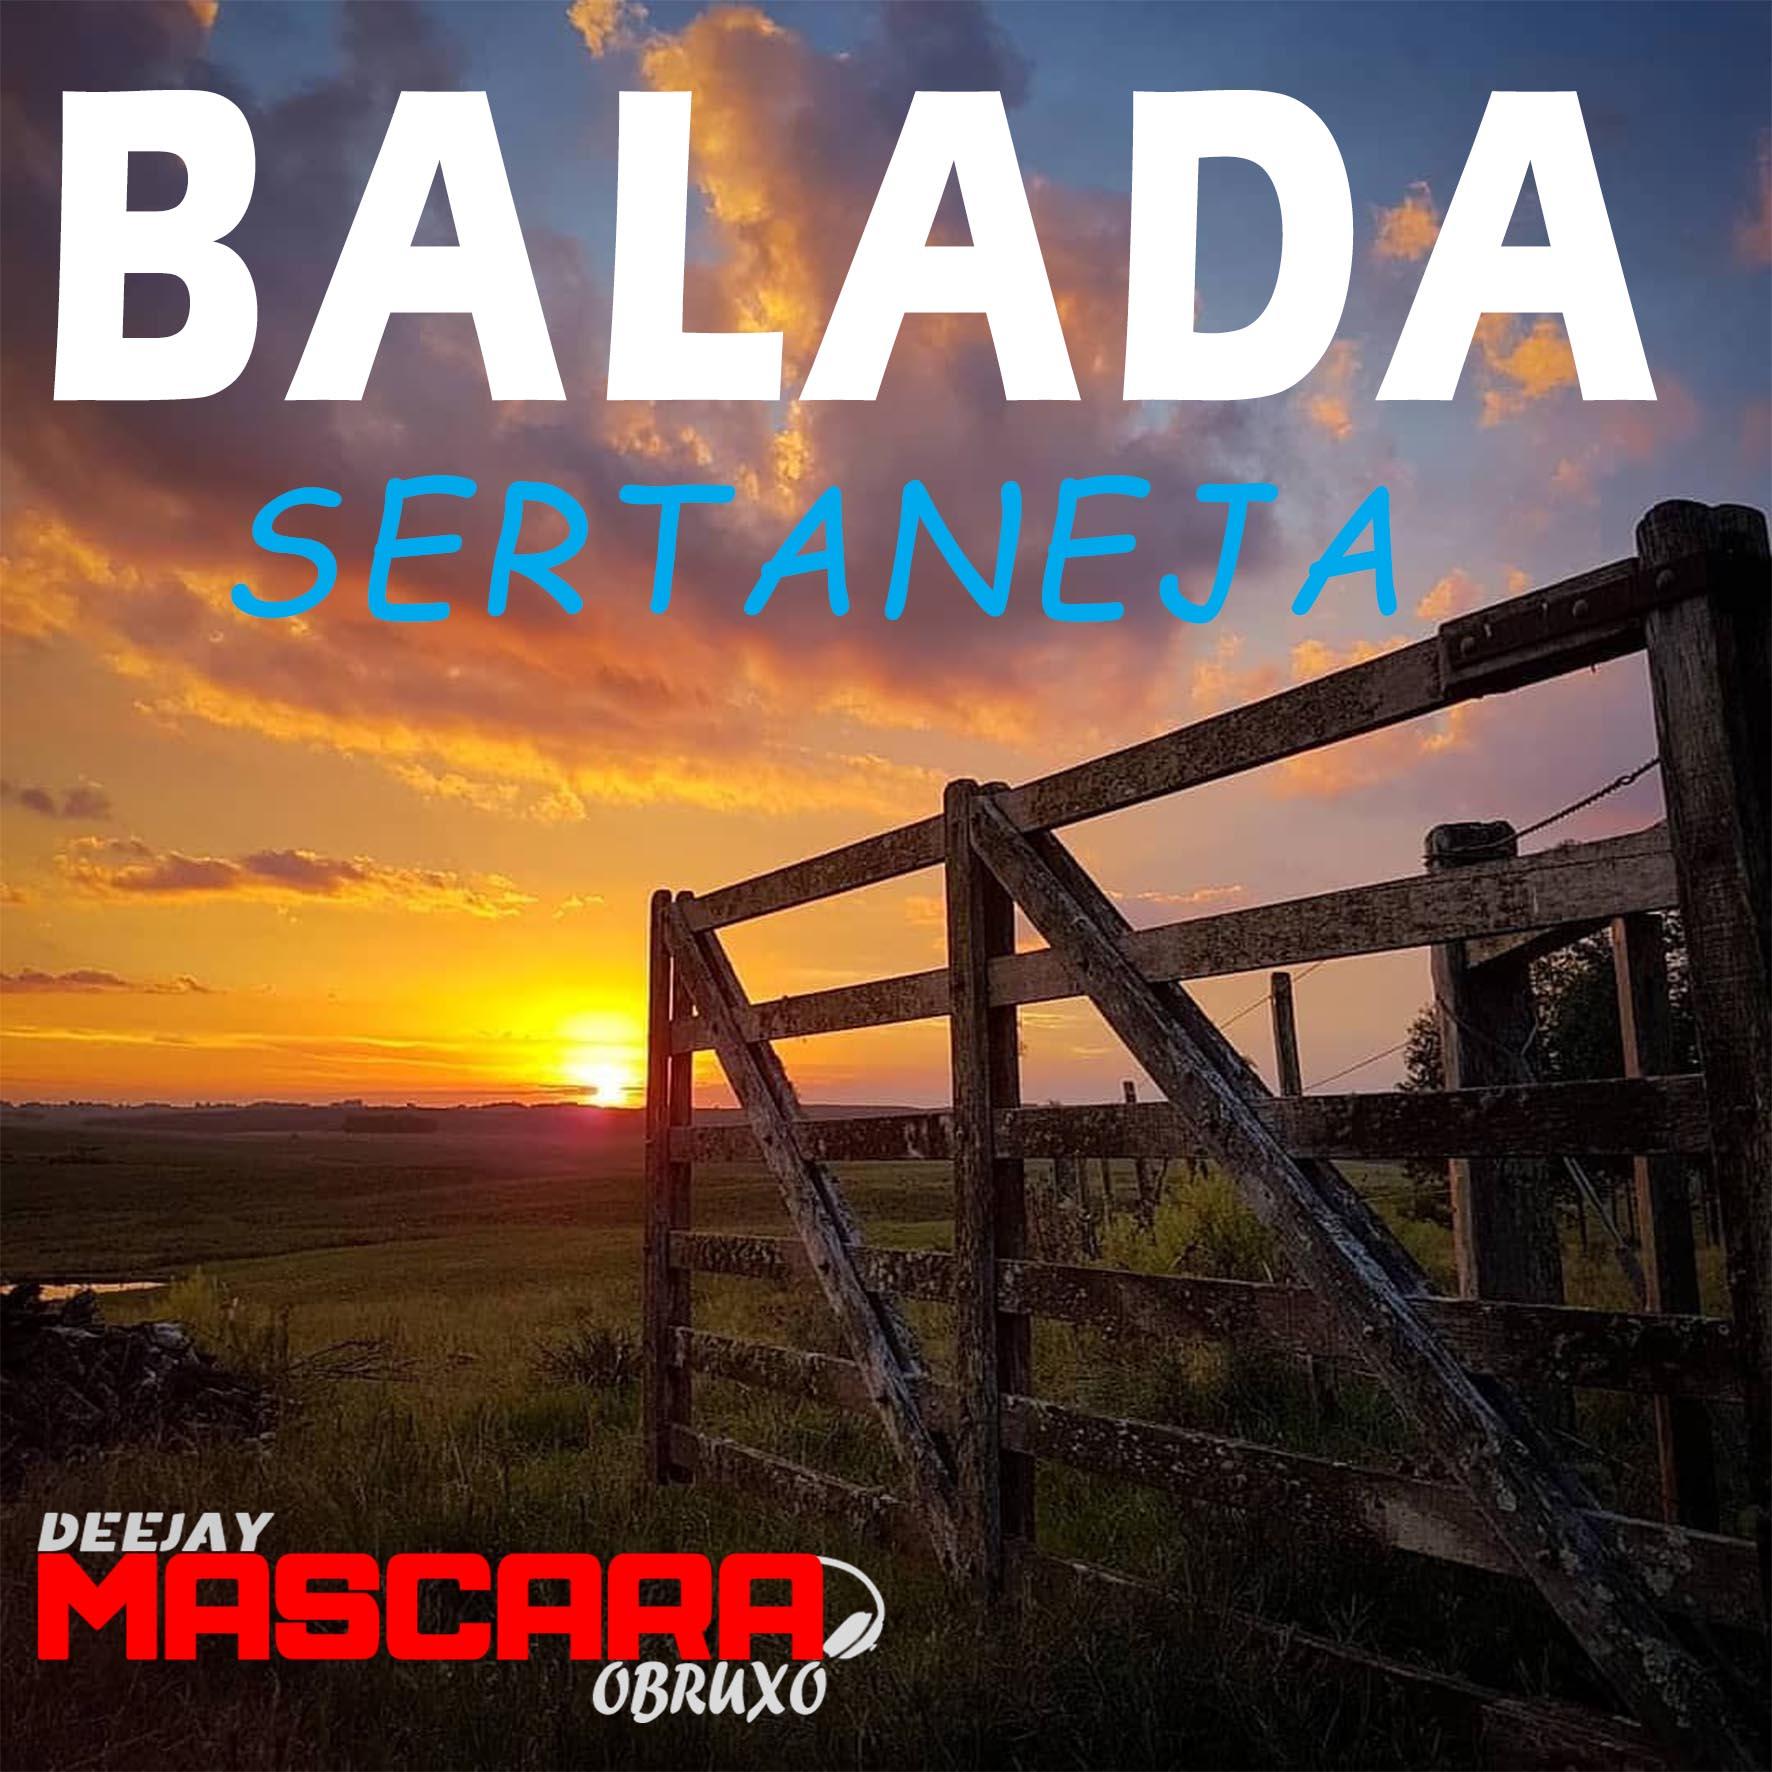 CD BALADA SERTANEJA _DJMASCARA